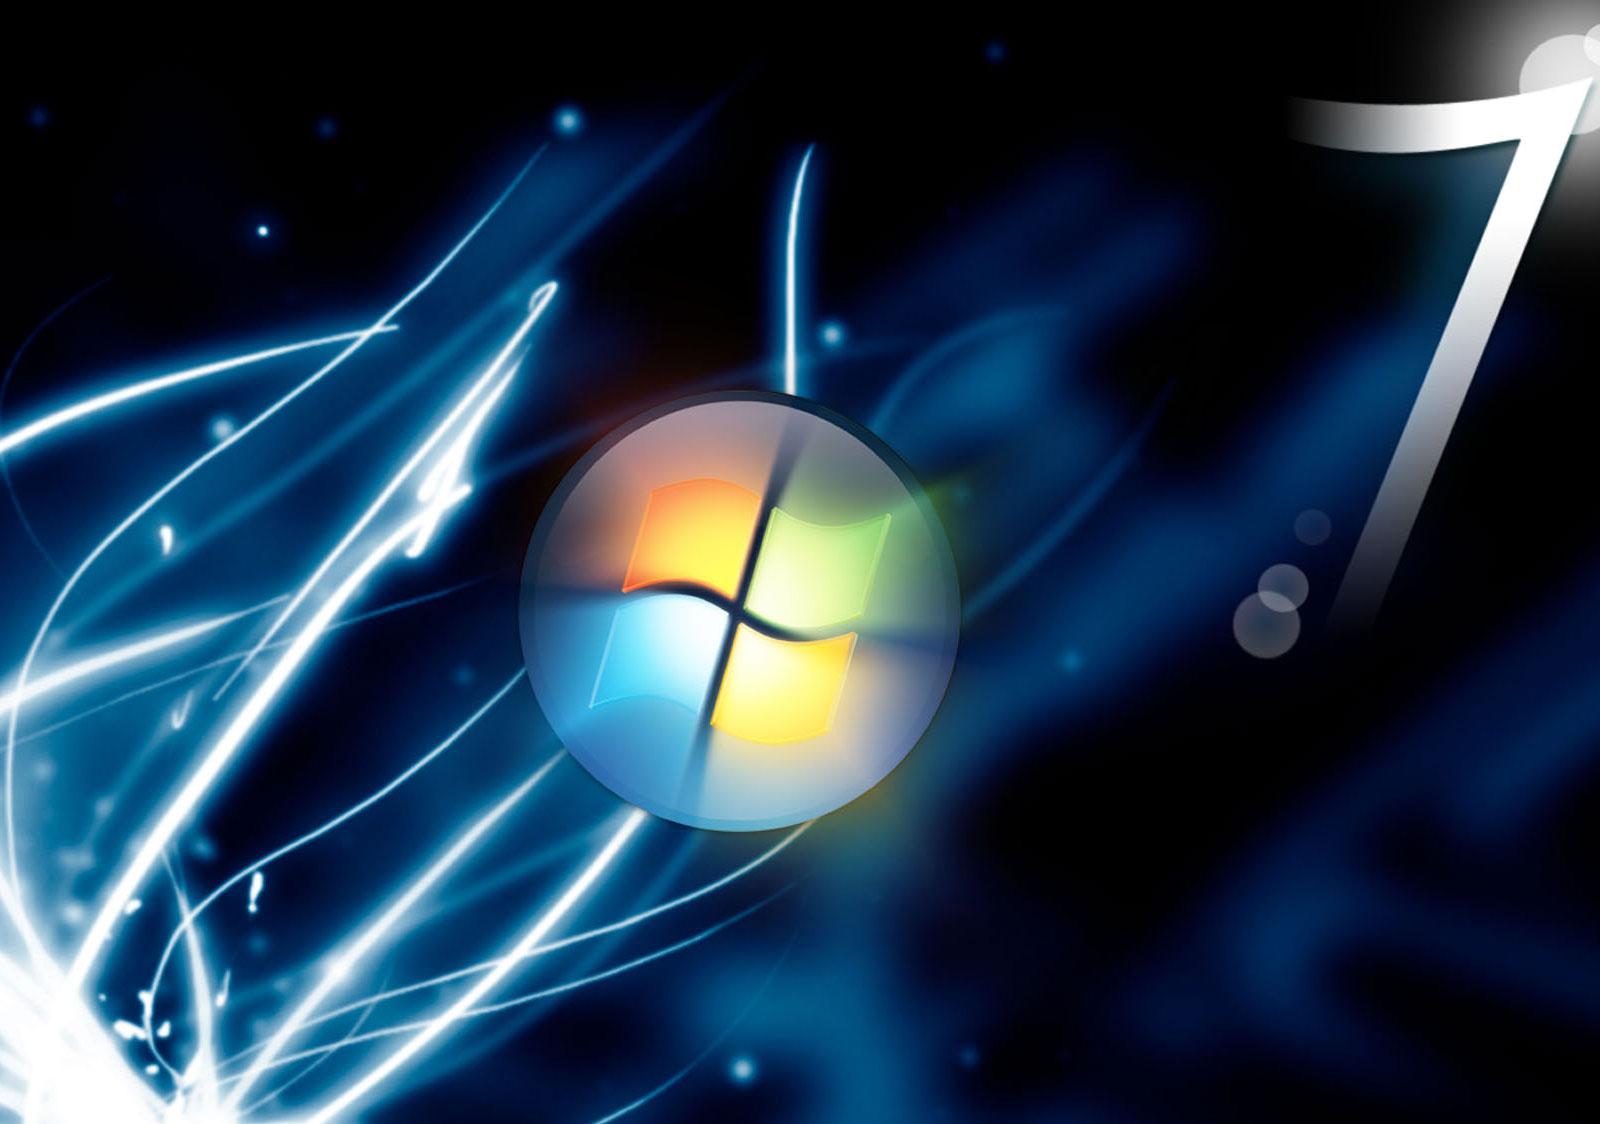 Animated Desktop Backgrounds For Windows Best - Animated Moving Wallpapers For Windows 7 - HD Wallpaper